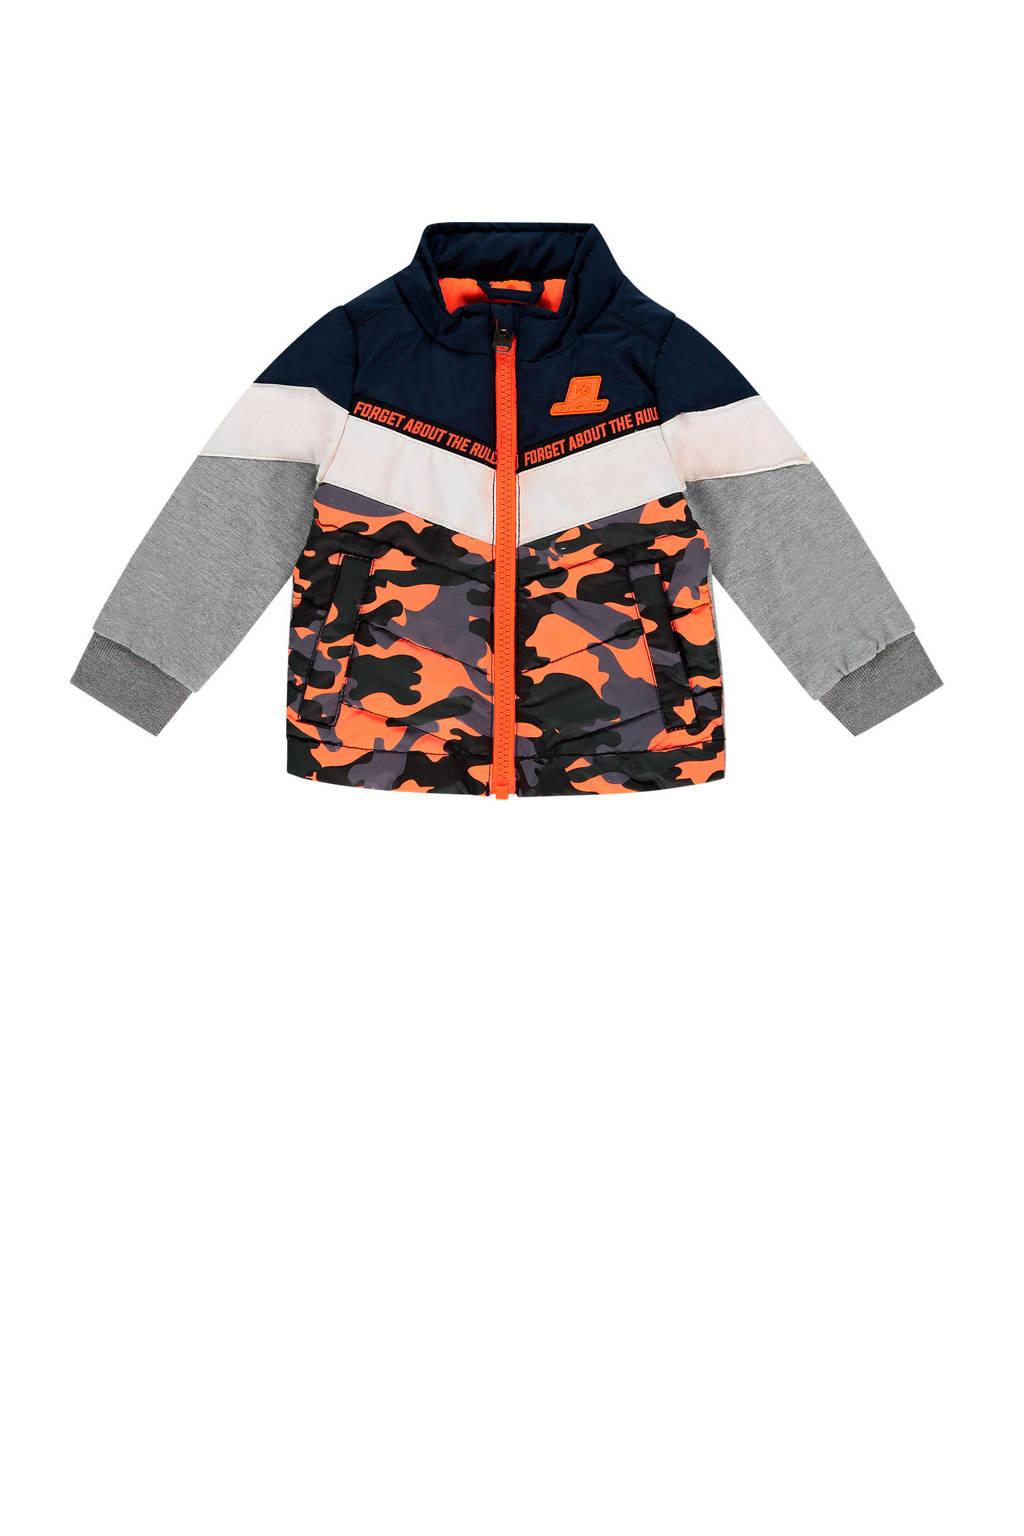 Vingino zomerjas Tamsir mini met camouflageprint donkerblauw/grijs melange/oranje, Donkerblauw/grijs melange/oranje